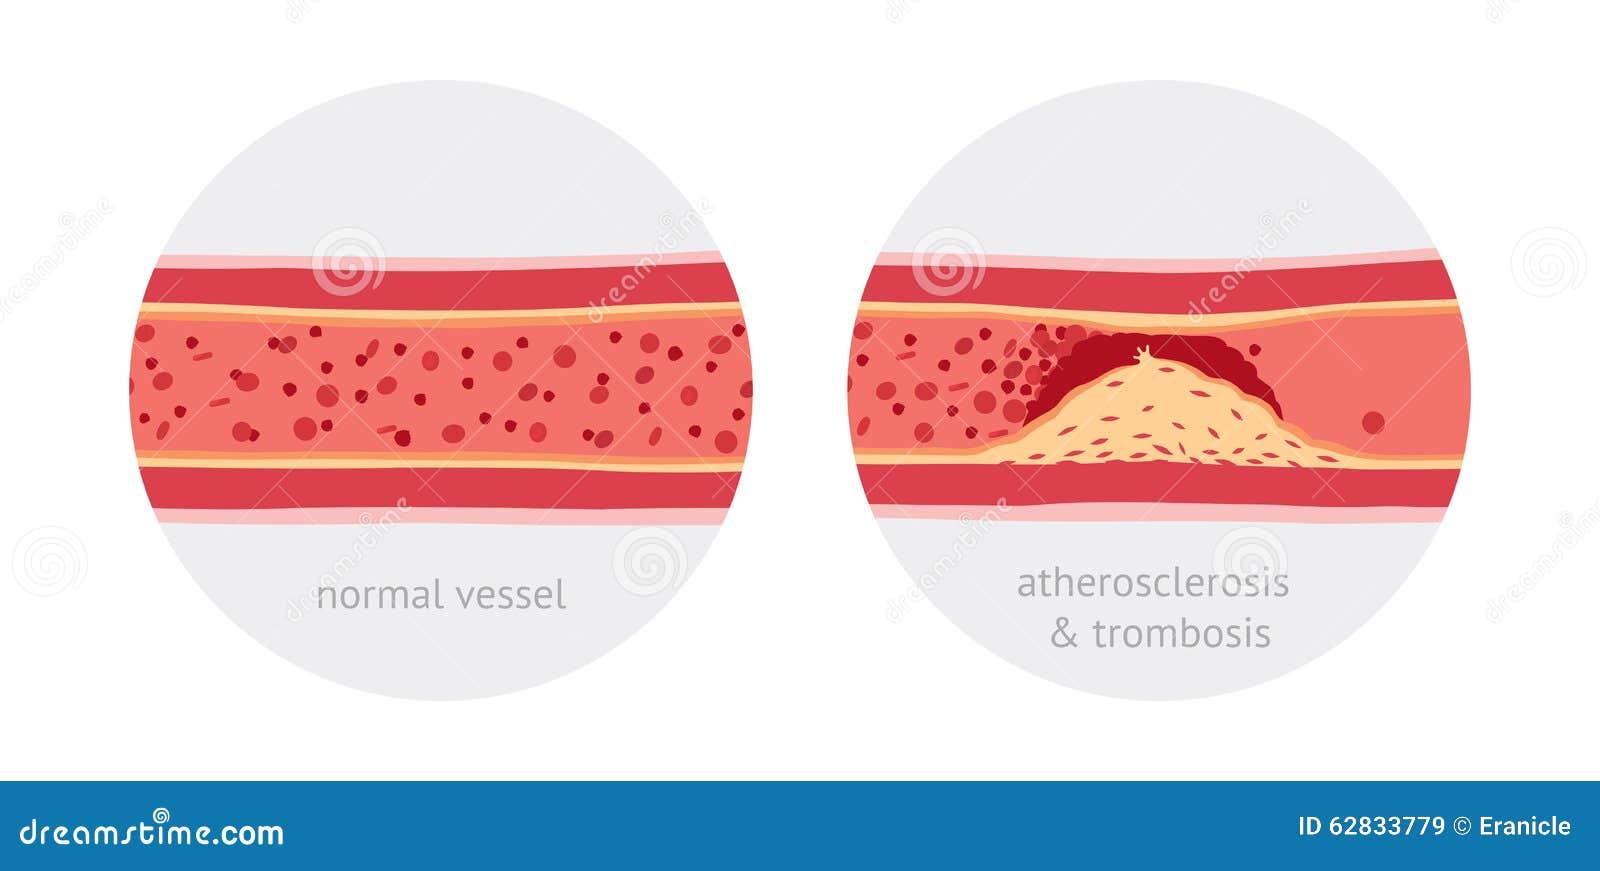 Atherotrombosis dans des navires